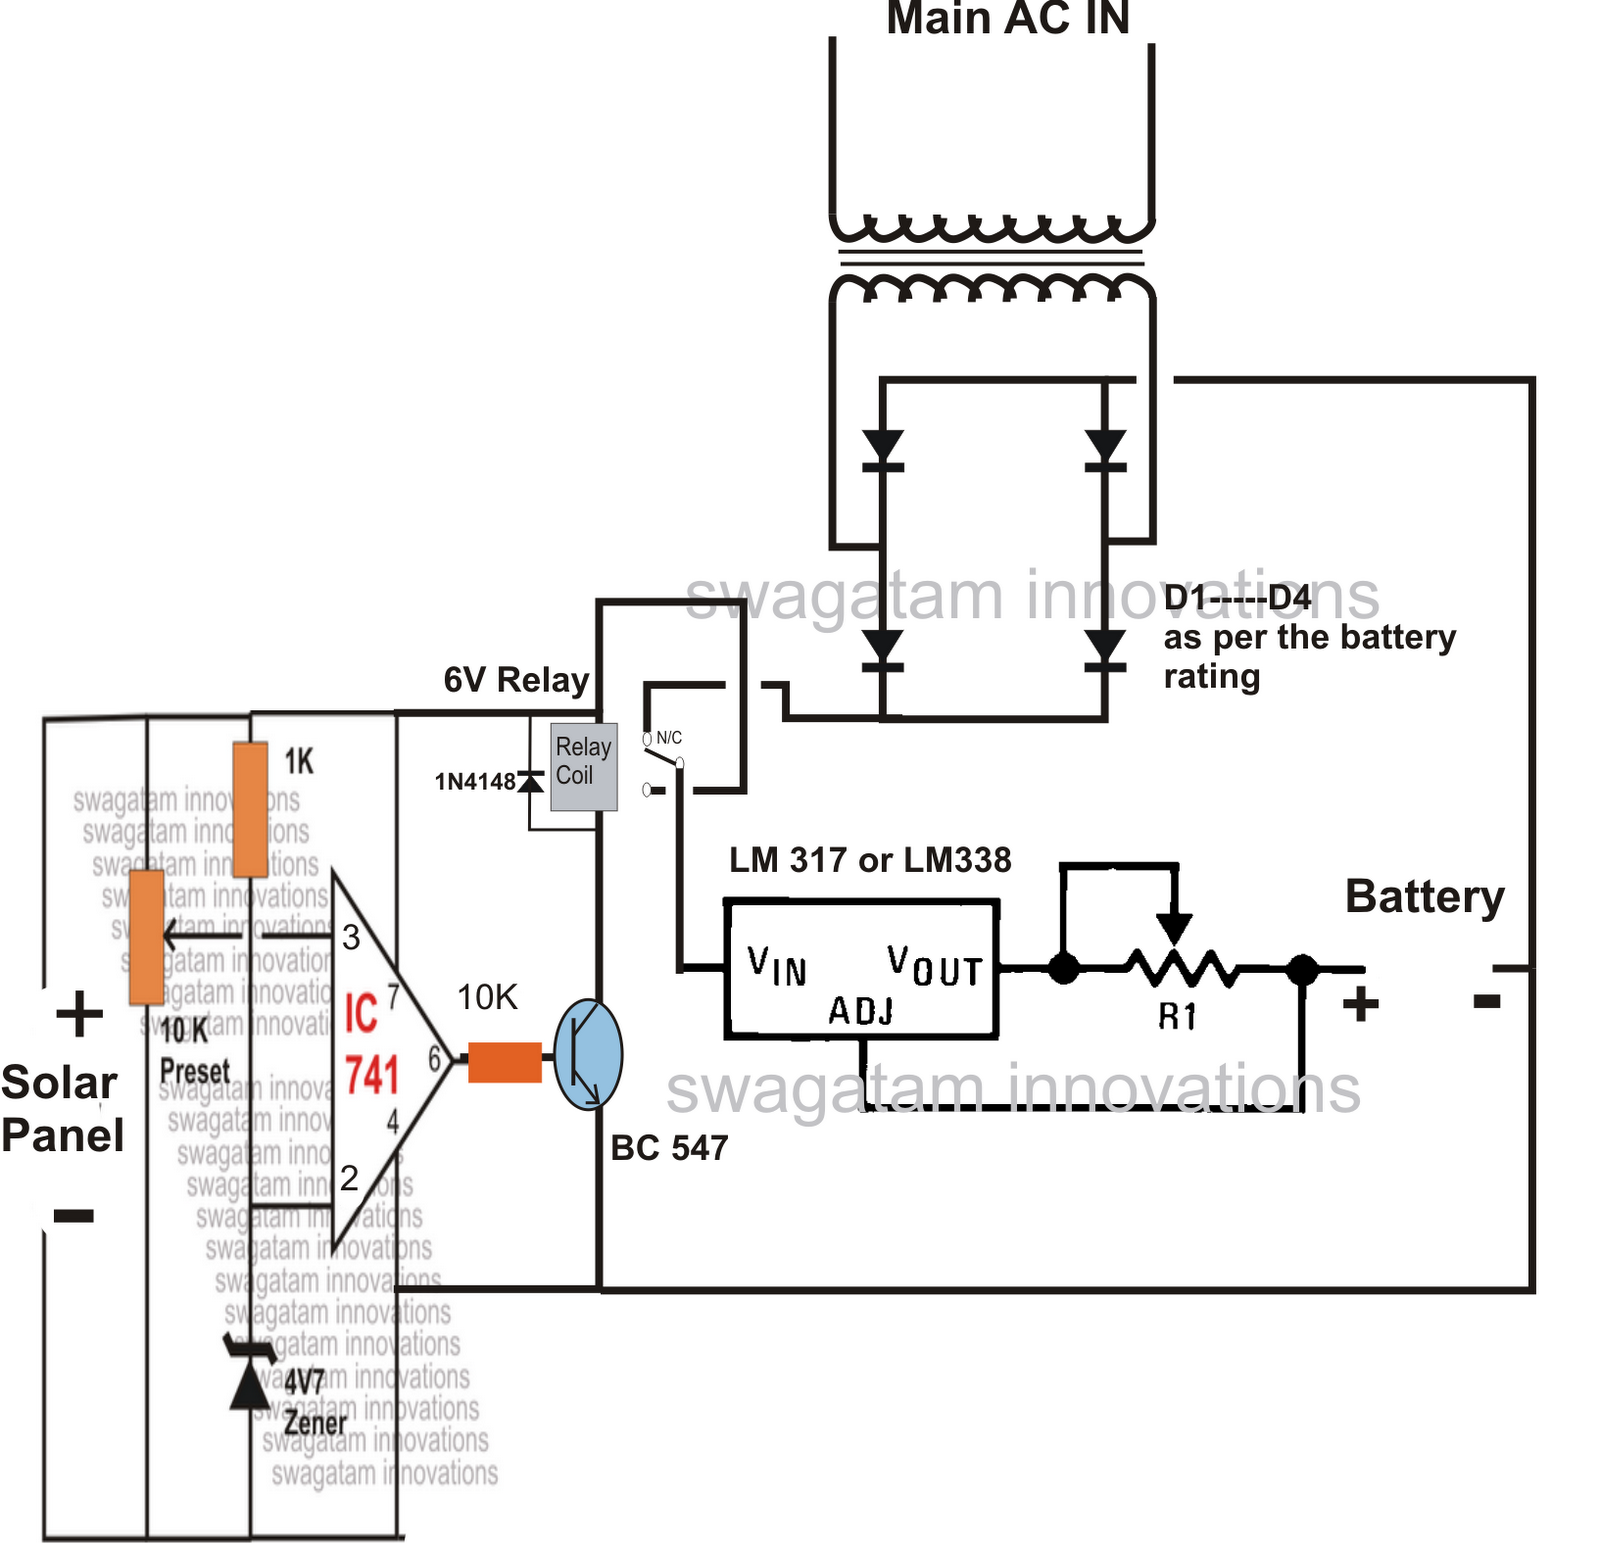 simple relay circuit diagram apollo rocket solar panel ac mains changeover